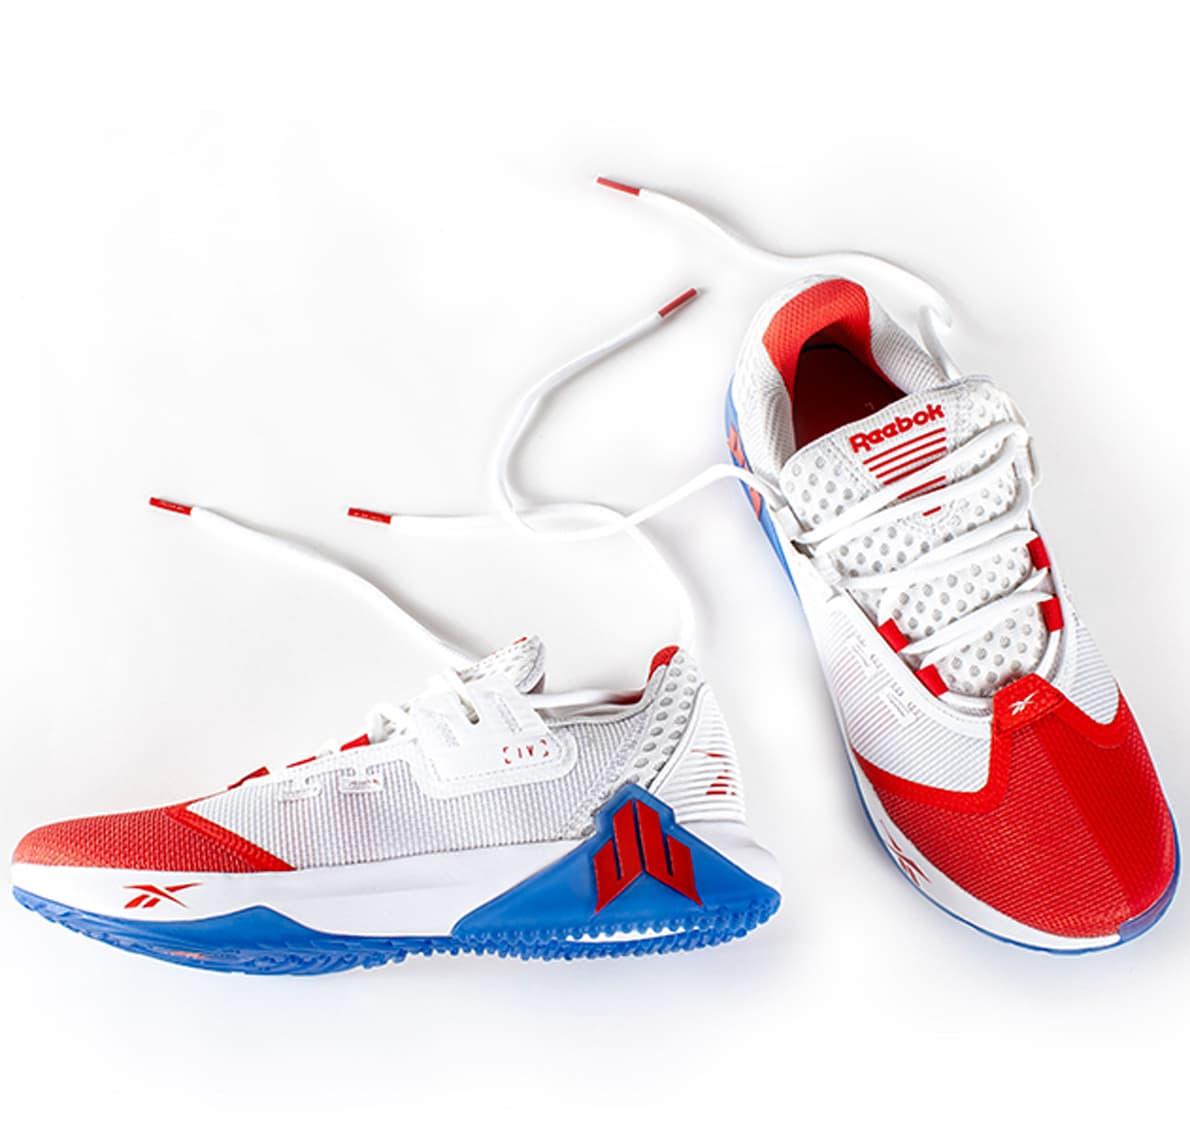 JJ IV Reebok Training Shoe00009